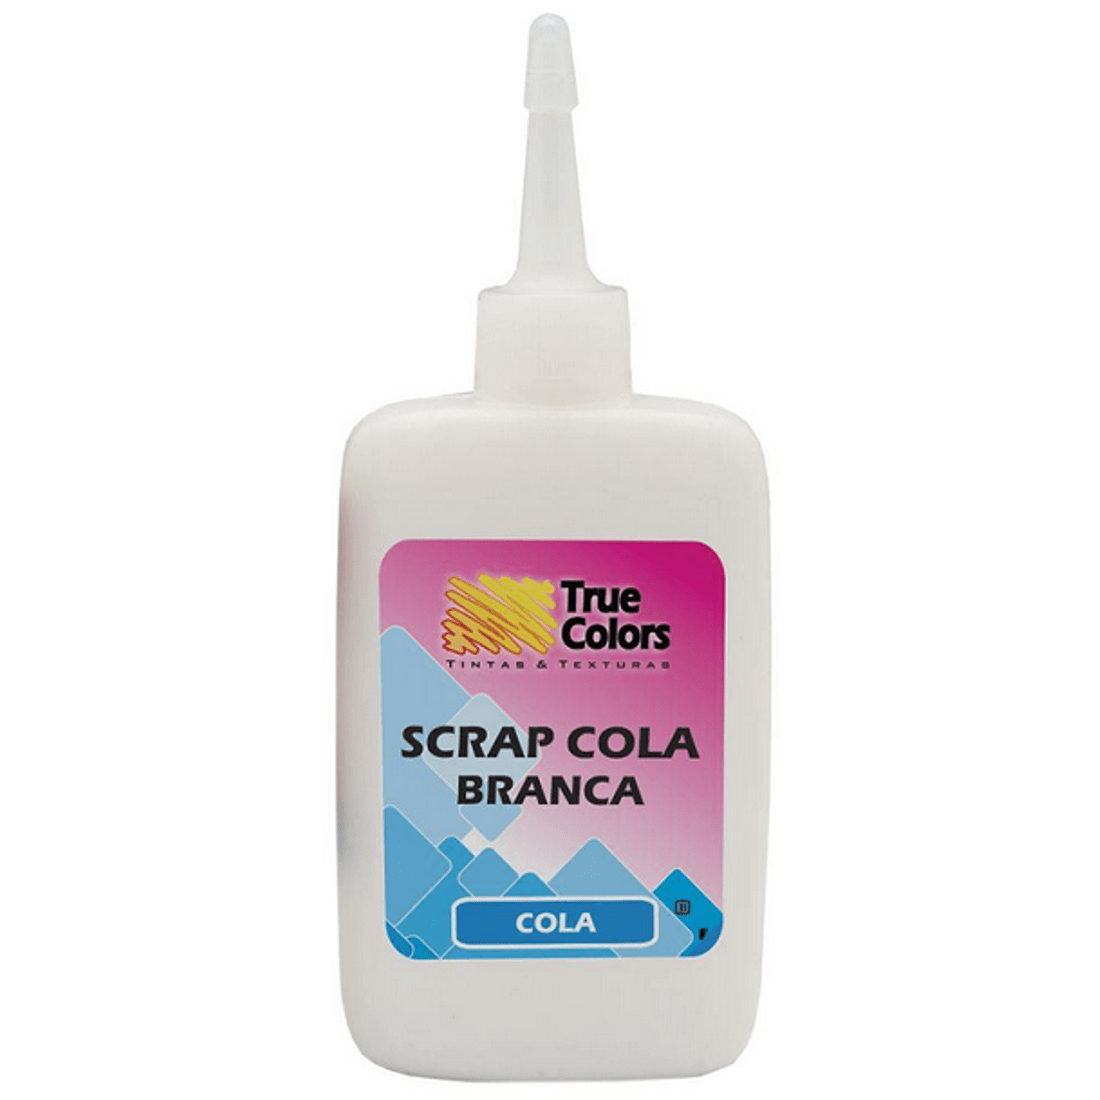 Scrap-Cola-Branca-90ml